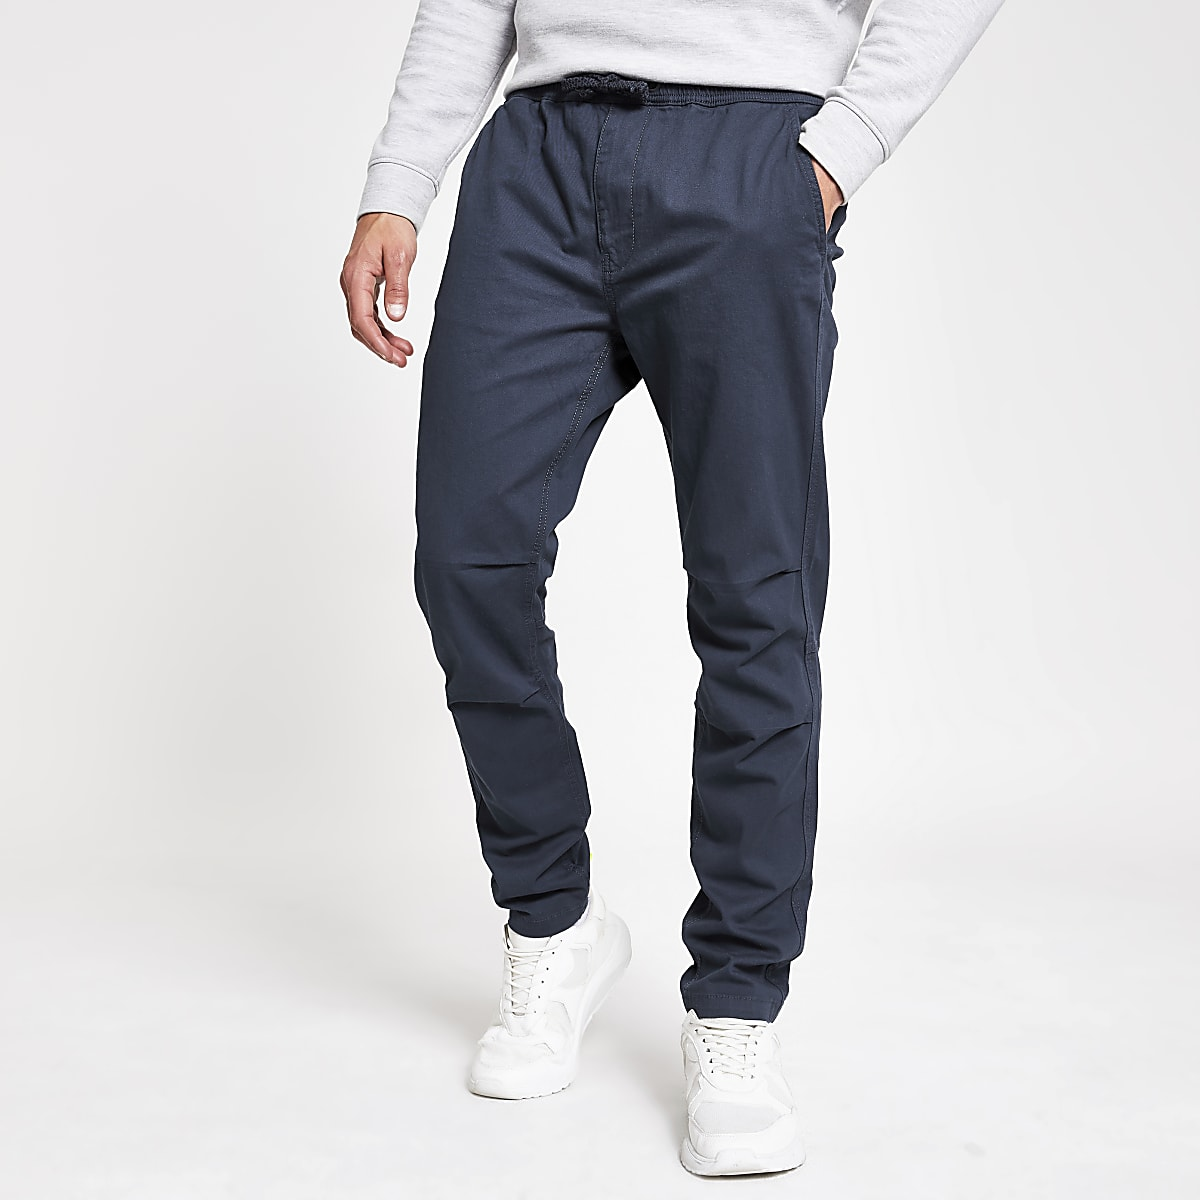 Superdry – Pantalon bleu fonctionnel